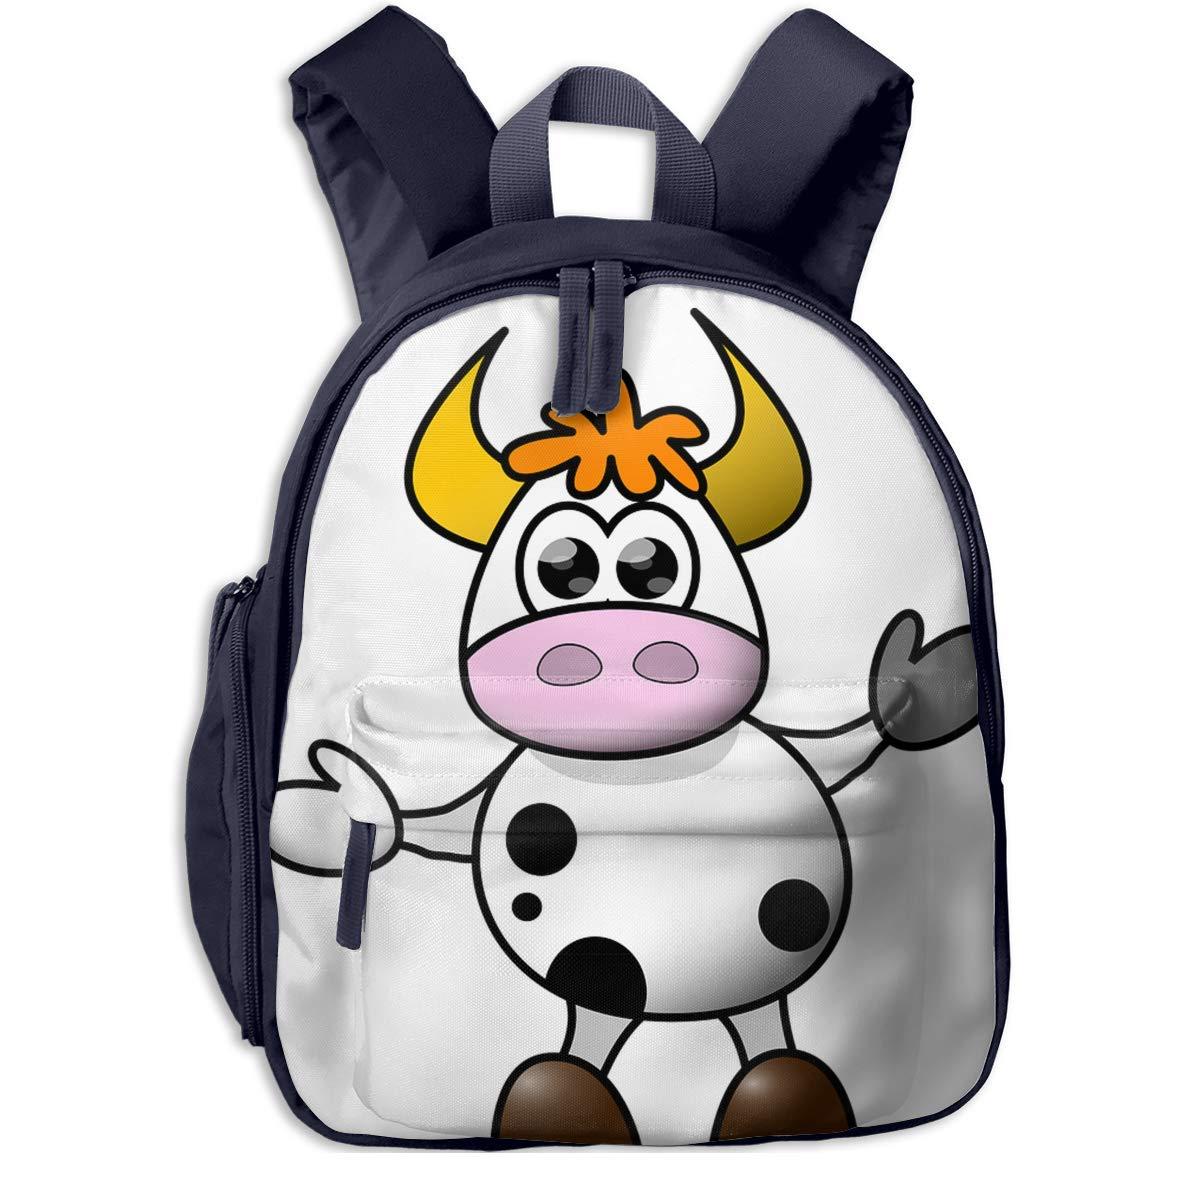 School School School Backpack for Girls Boys, Kids Cute Farbe Cow Cartoon Backpacks Book Bag B07MNS2D96 Daypacks Verrückter Preis 989d98